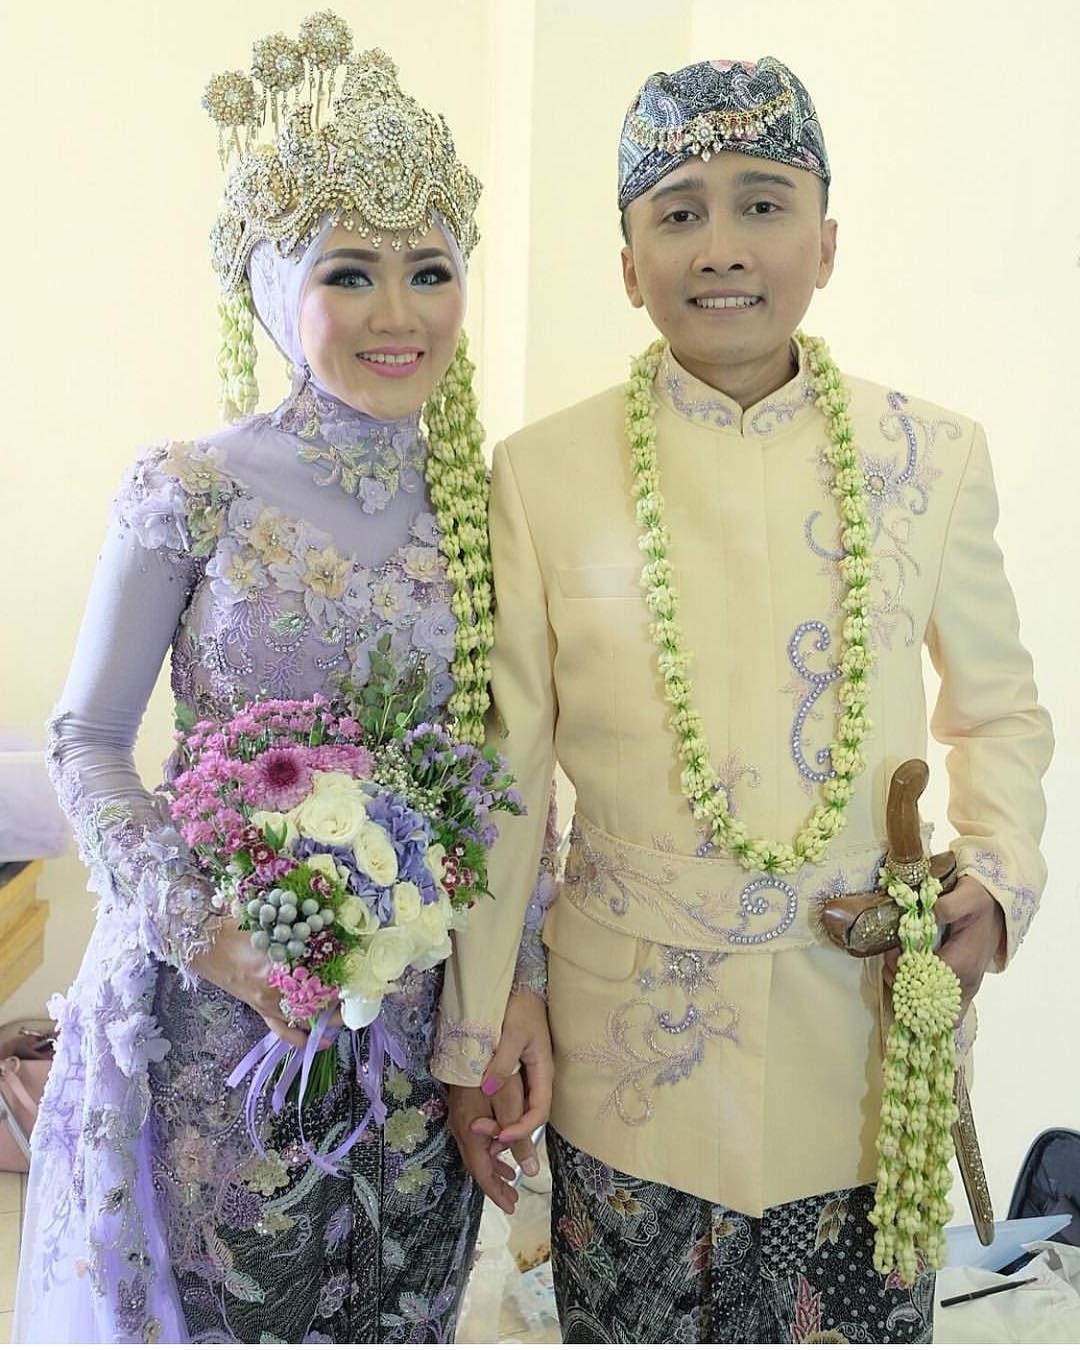 Ide Baju Pengantin Muslimah Jawa Syar'i Whdr 17 Model Baju Pengantin Muslim 2018 Desain Elegan Cantik